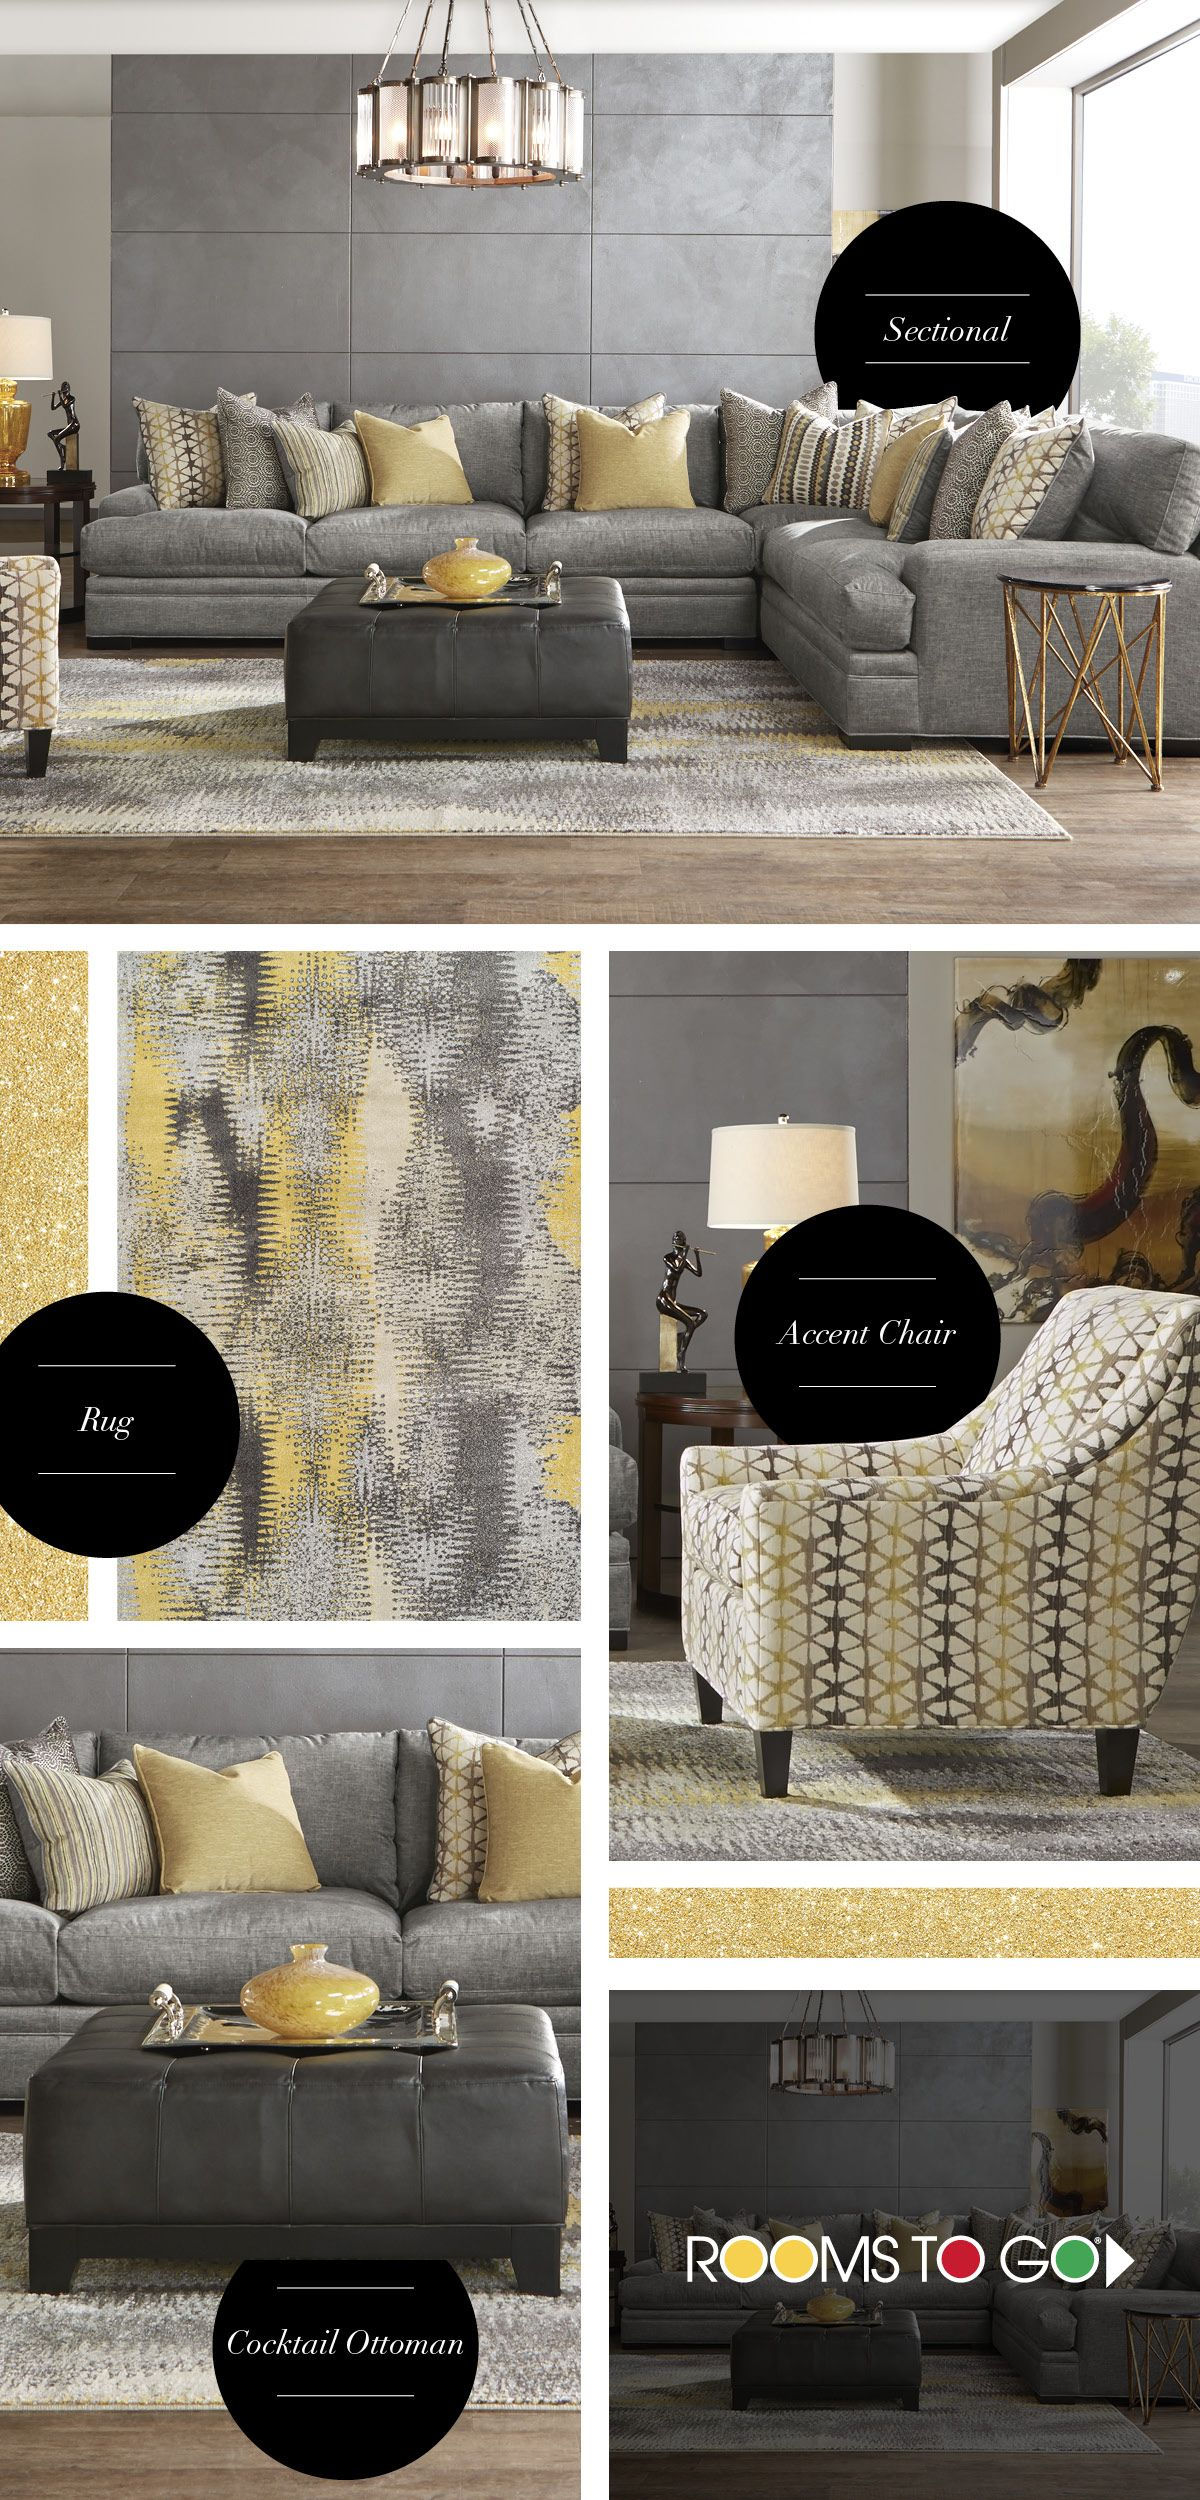 HGTV HOME Design Studio CU 2 L Shaped Sectional by Bassett